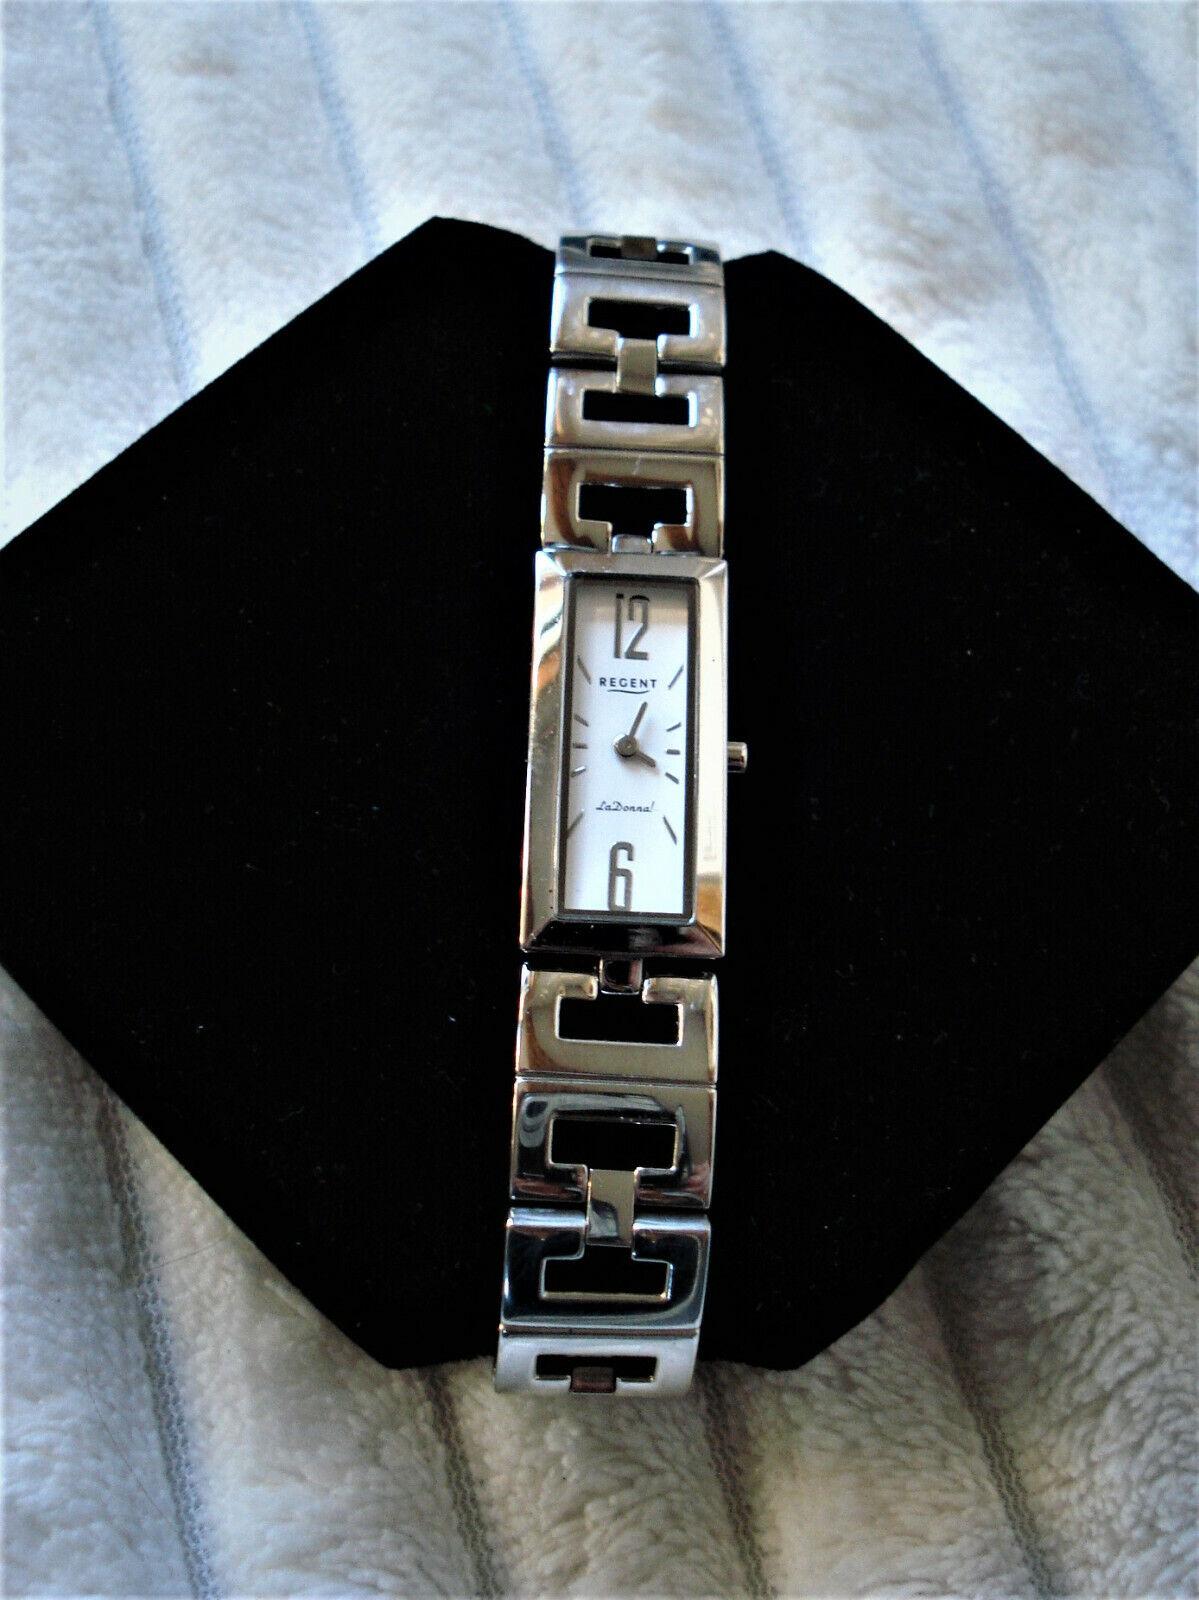 REGENT Uhr LD1123 La Donna! eckige flache Damen Armbanduhr silber-farbig